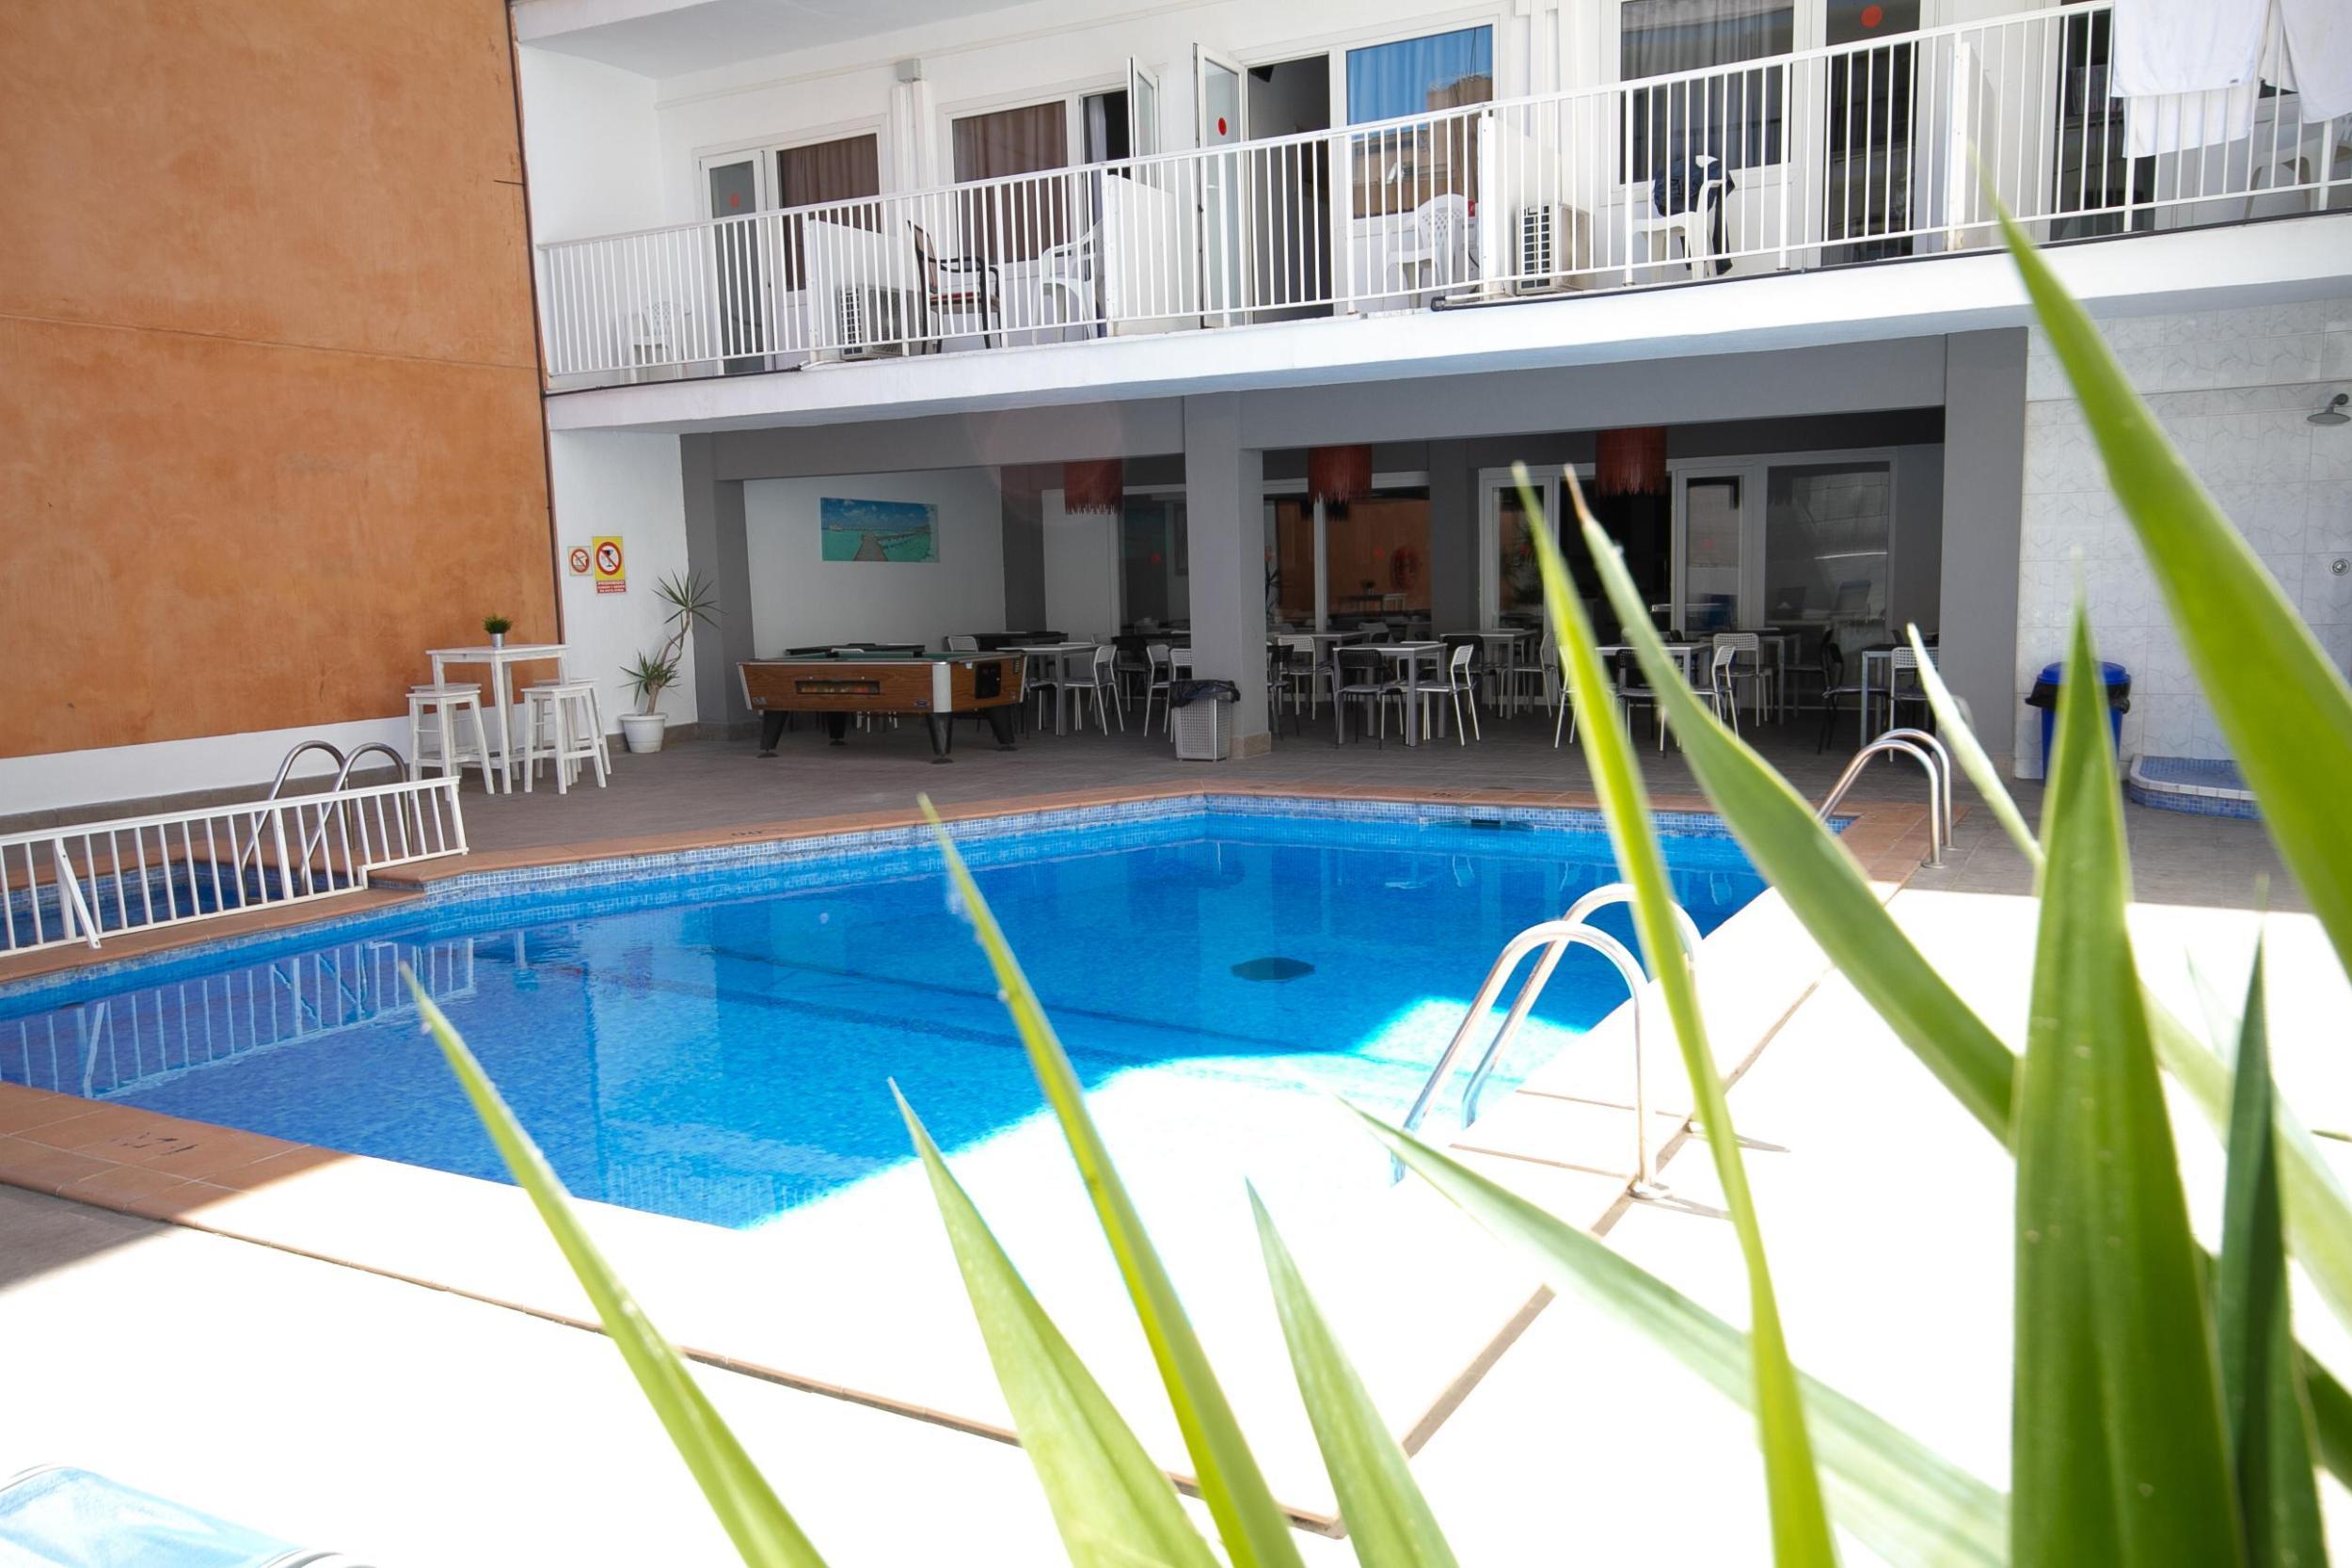 Hotel Teide Mallorca Email